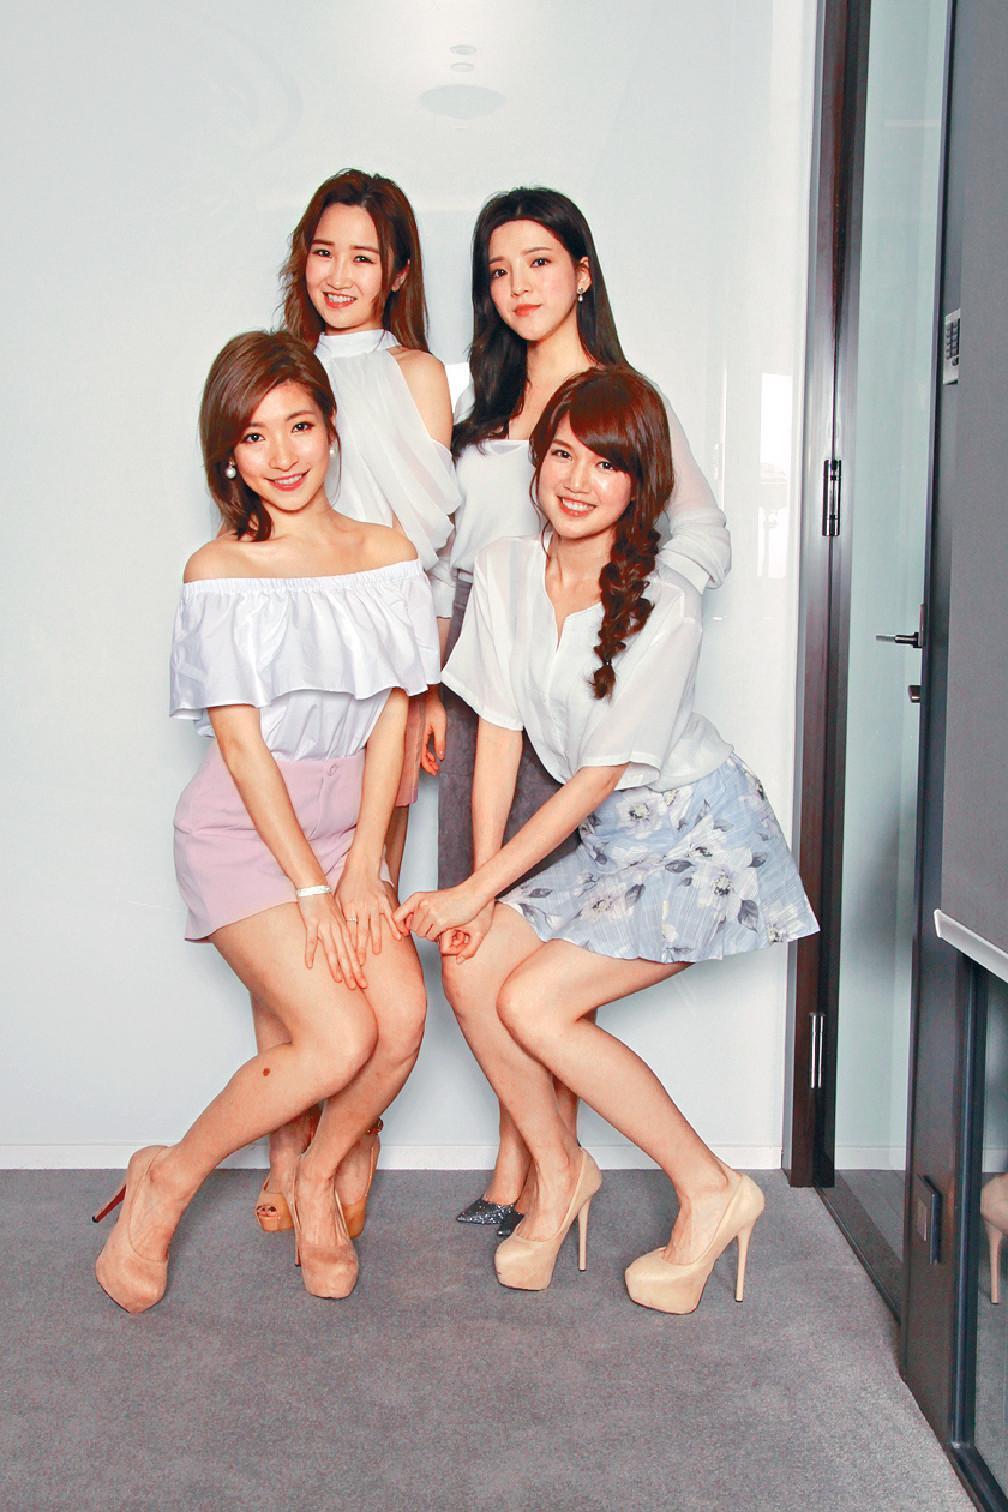 paco名人會 新歌mv誘惑眾生as one苦練辣身舞上陣 專欄 頭條日報